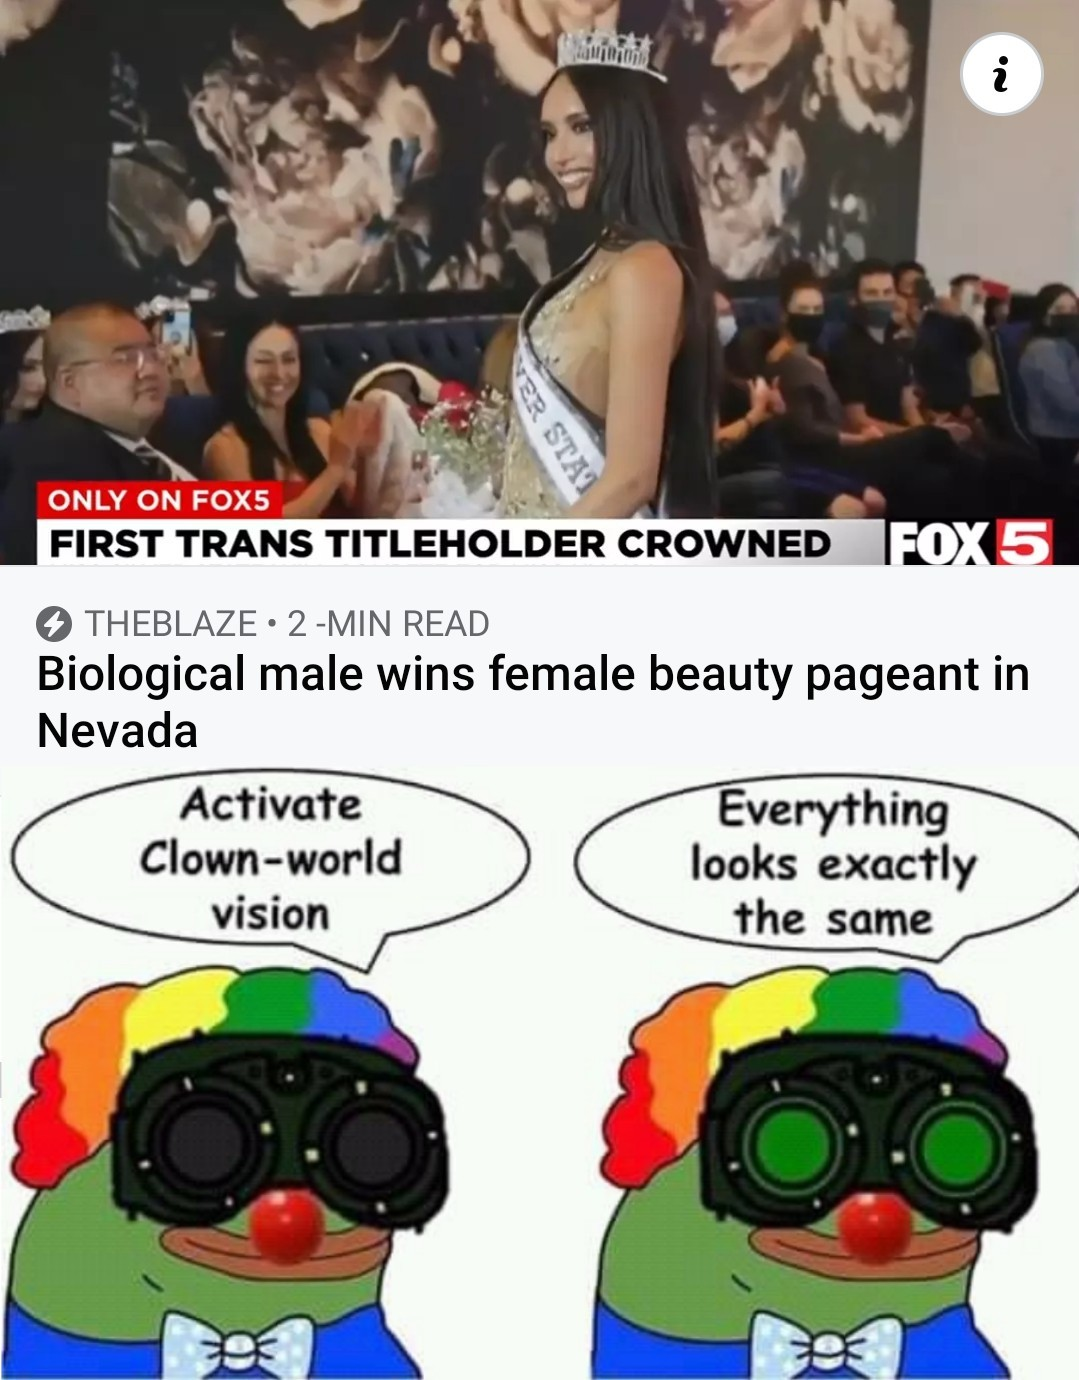 'A celebration of womanhood and diversity' - meme